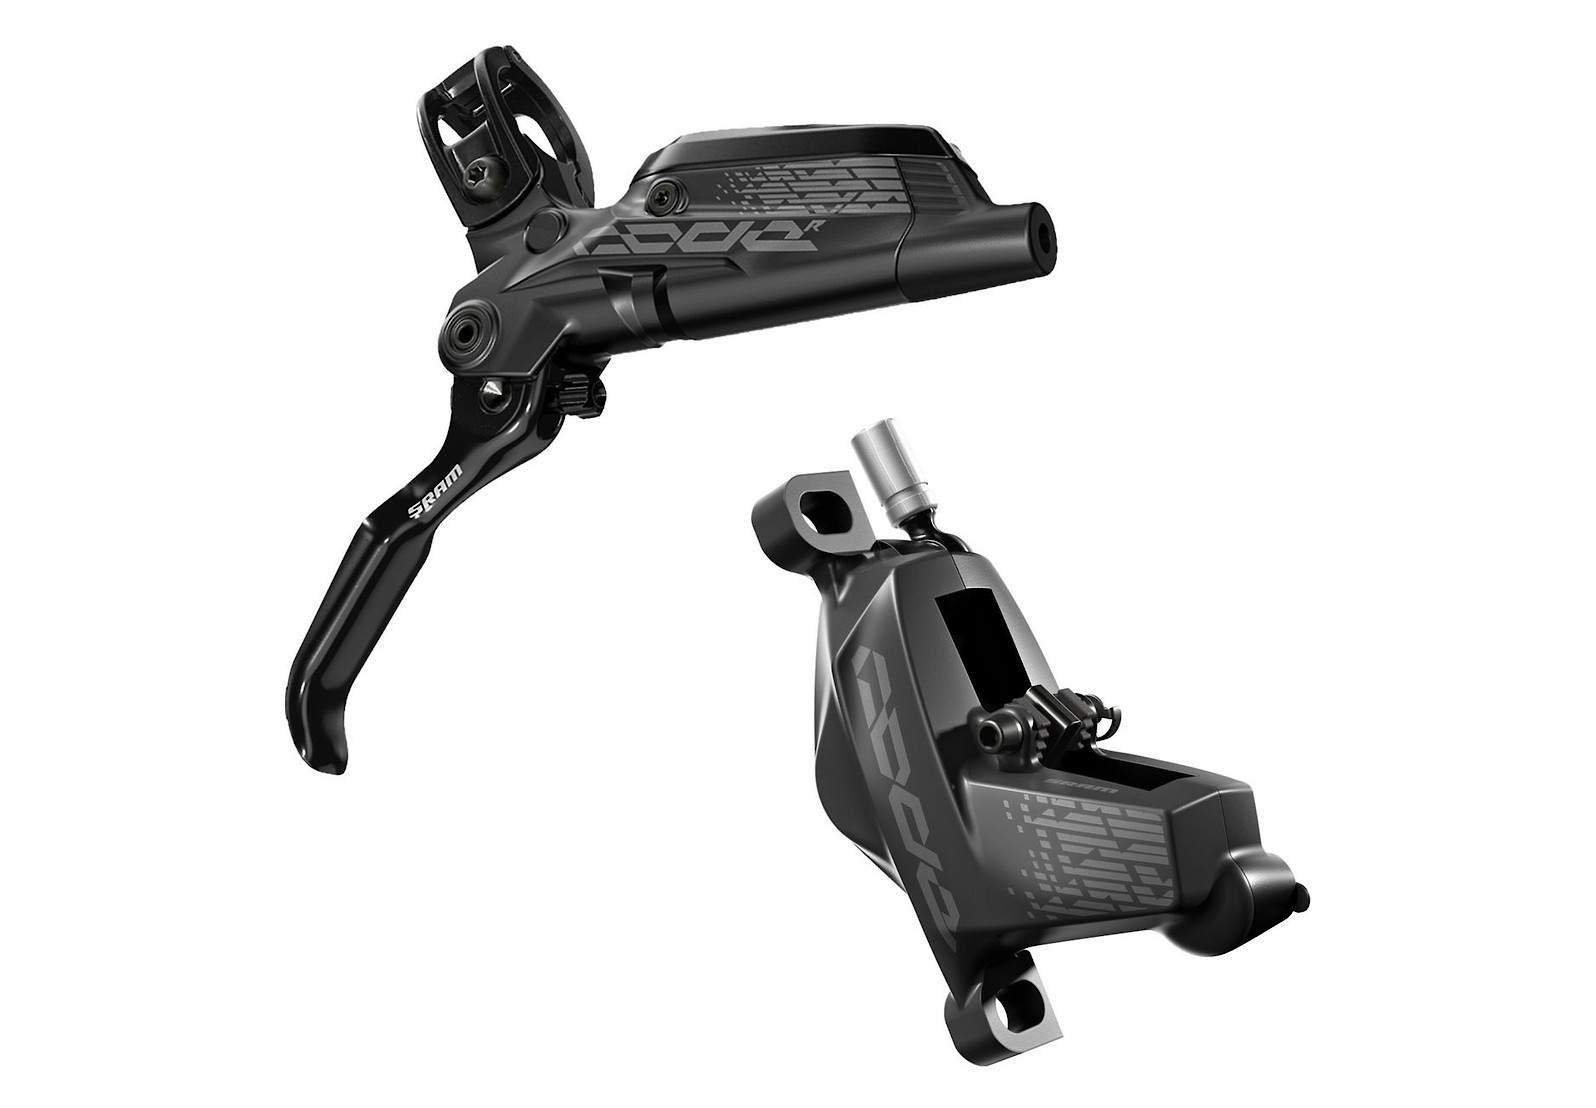 SRAM Code R Disc Brakes - Reviews, Comparisons, Specs